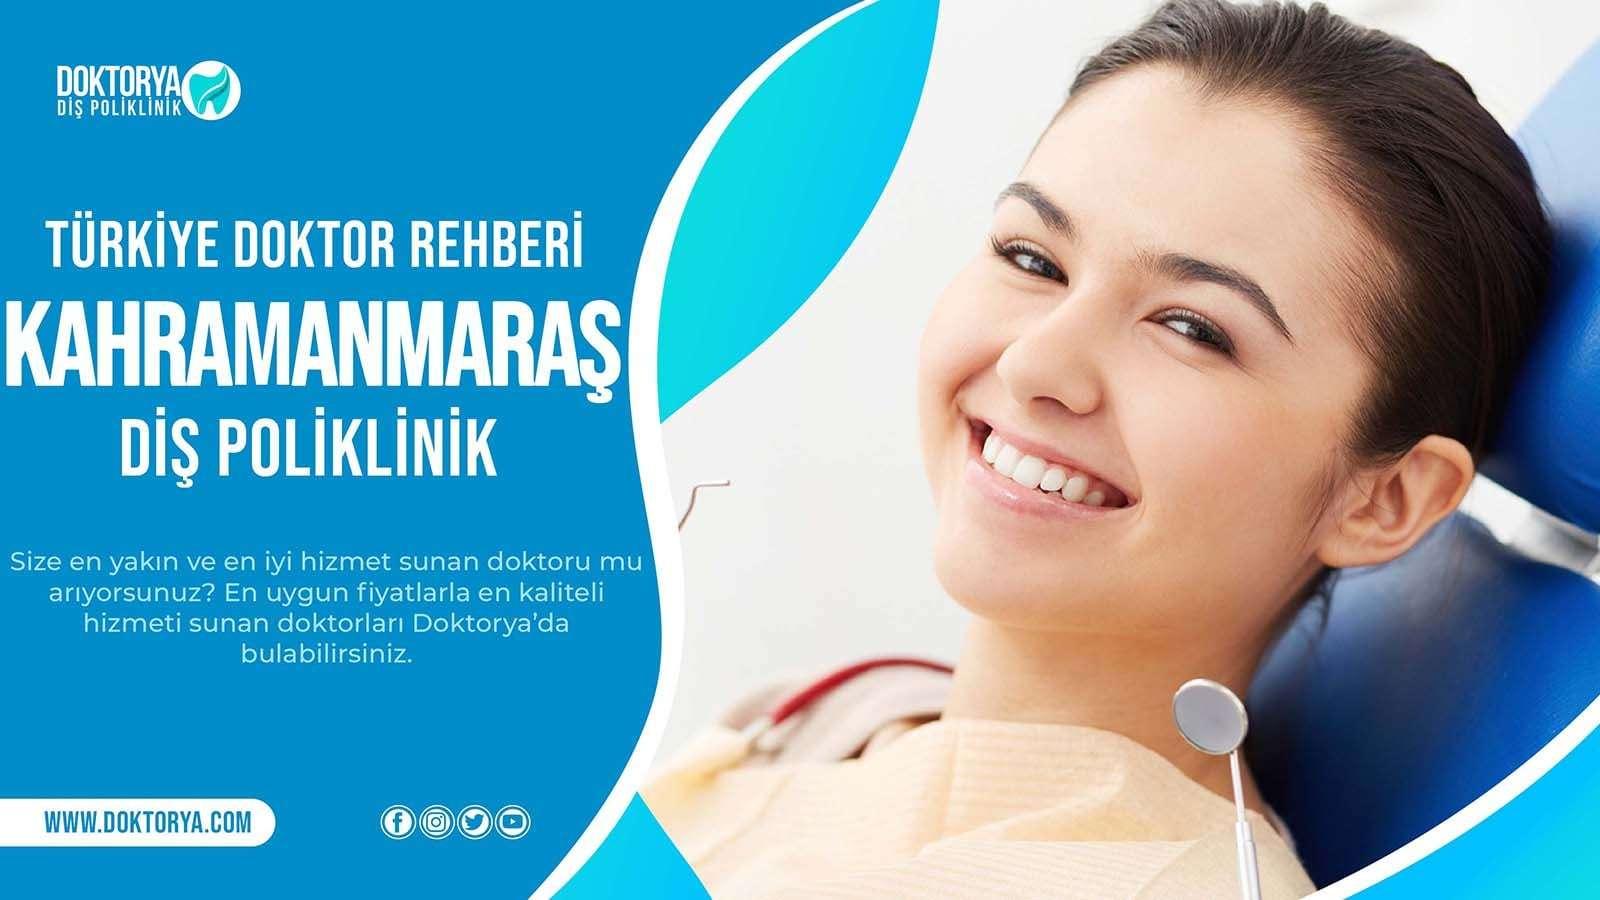 Kahramanmaraş Diş Poliklinik